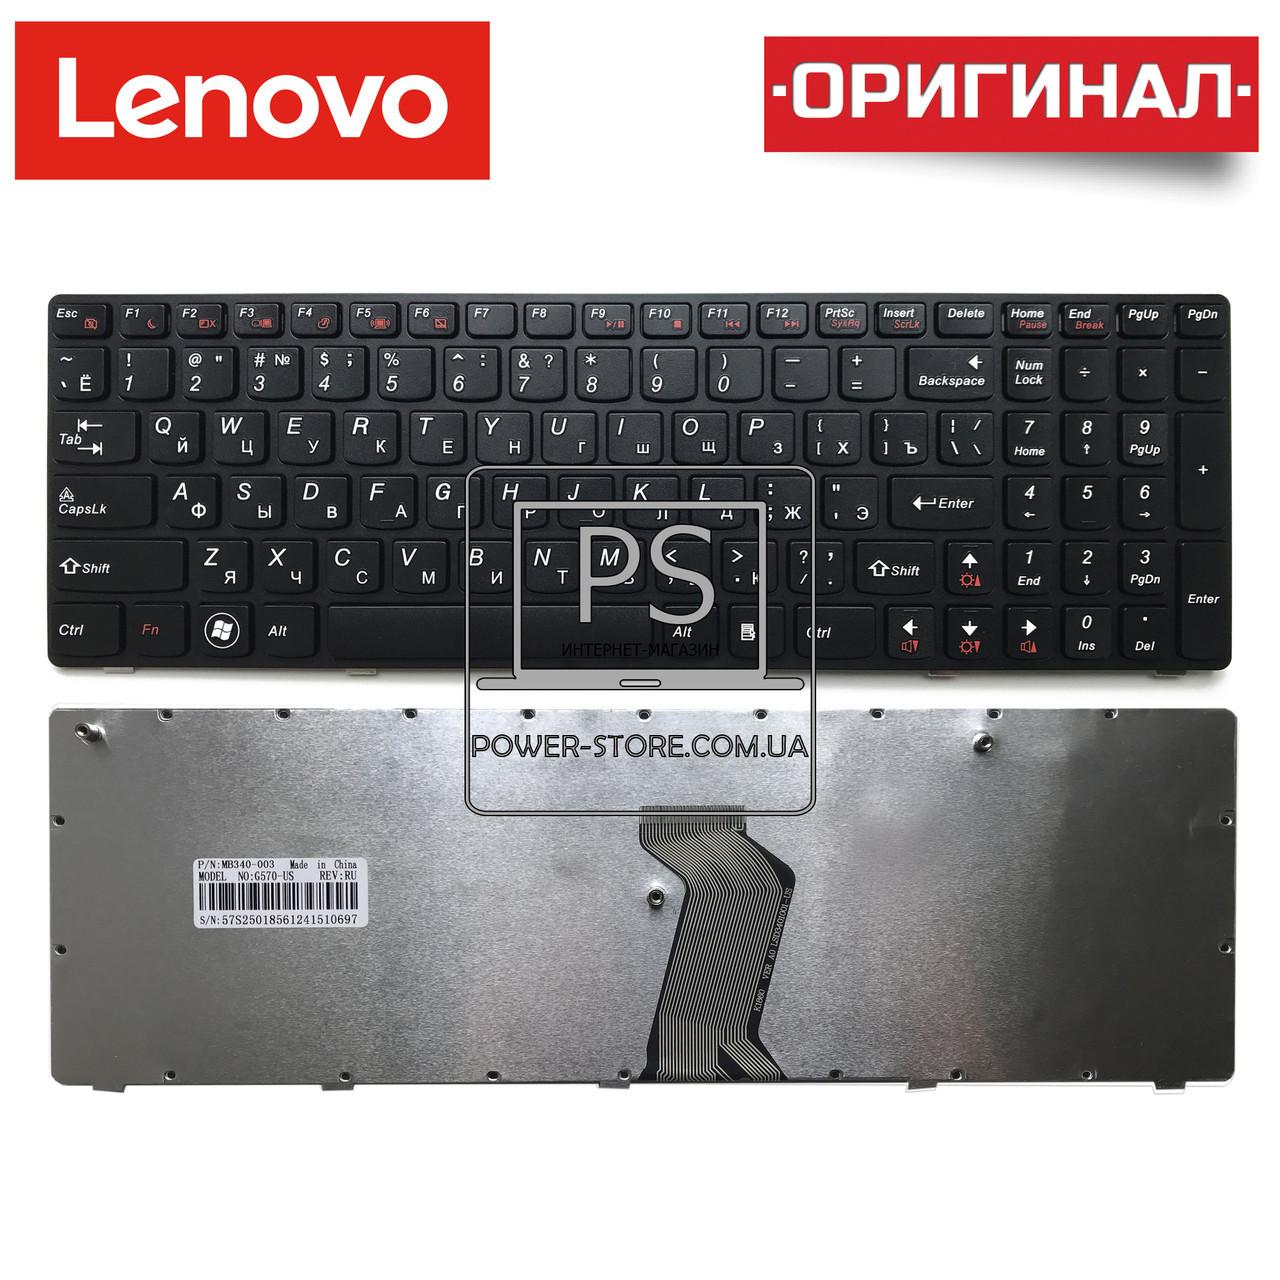 Клавиатура  для ноутбука LENOVO  25-012343, 25-012344, 25-012345, 25-012346, 25-012347,